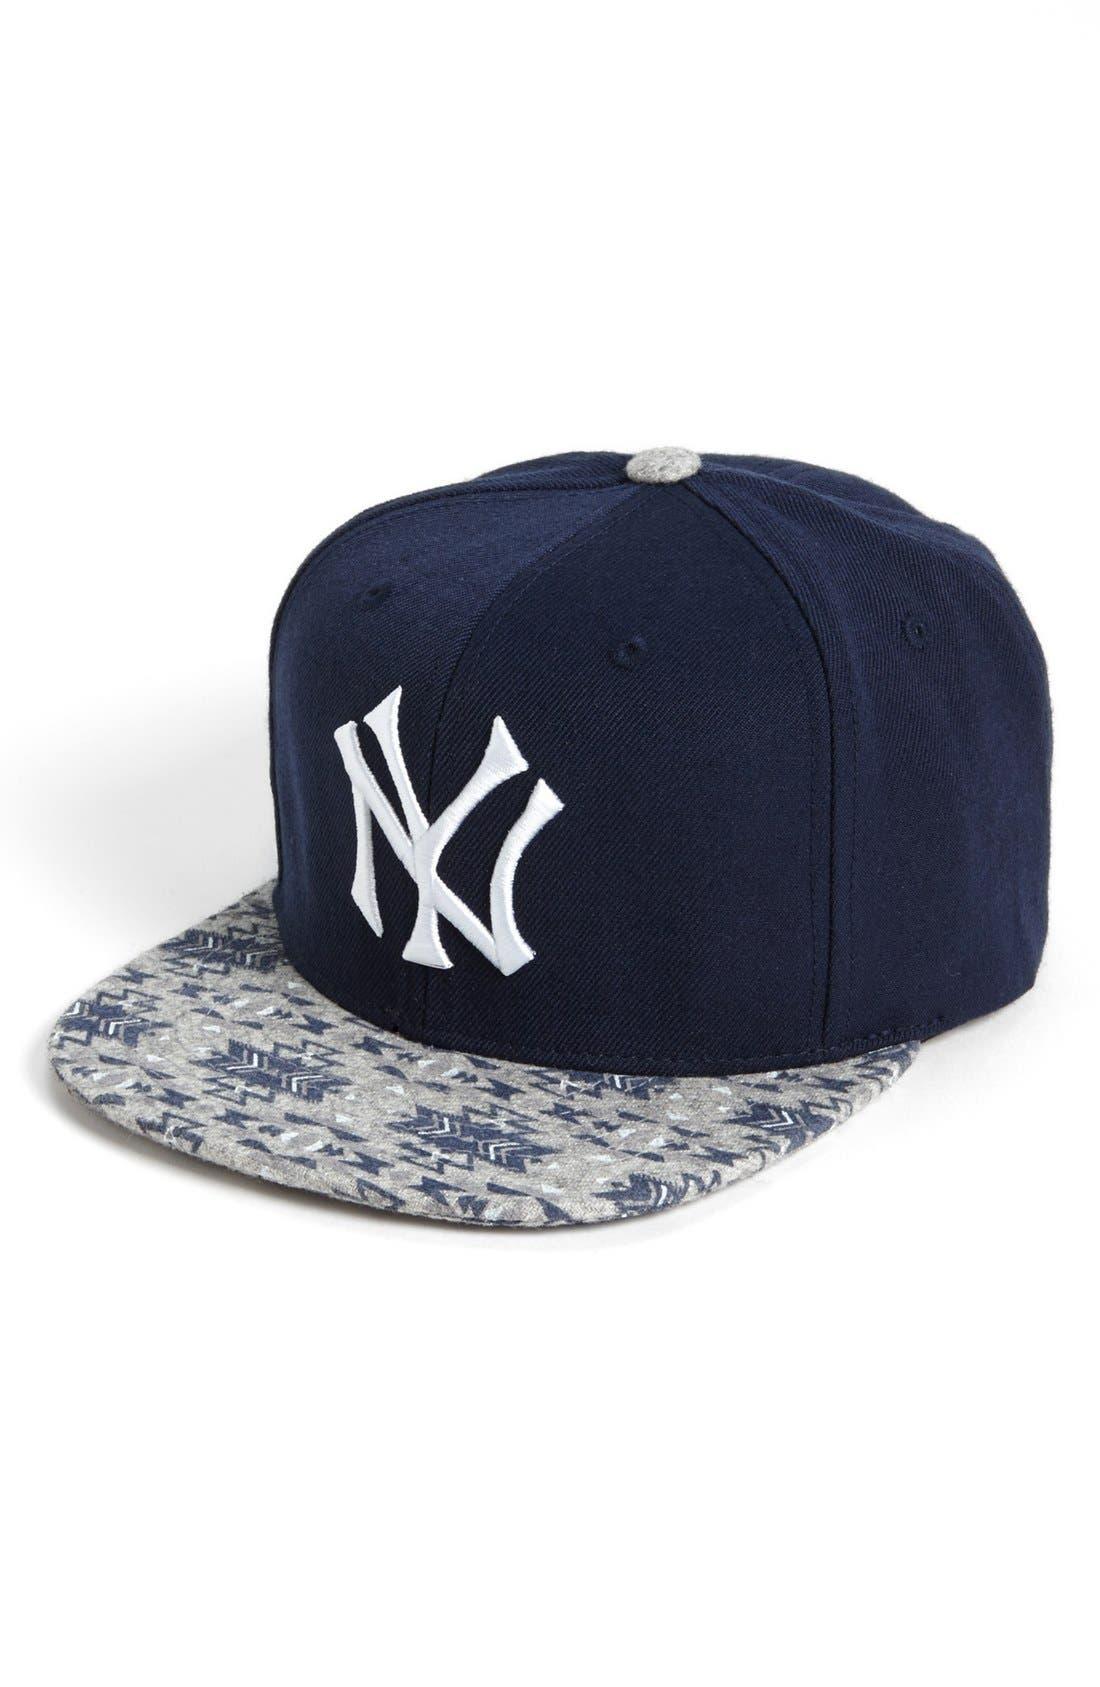 Main Image - American Needle 'New York Yankees Print Bill' Baseball Cap